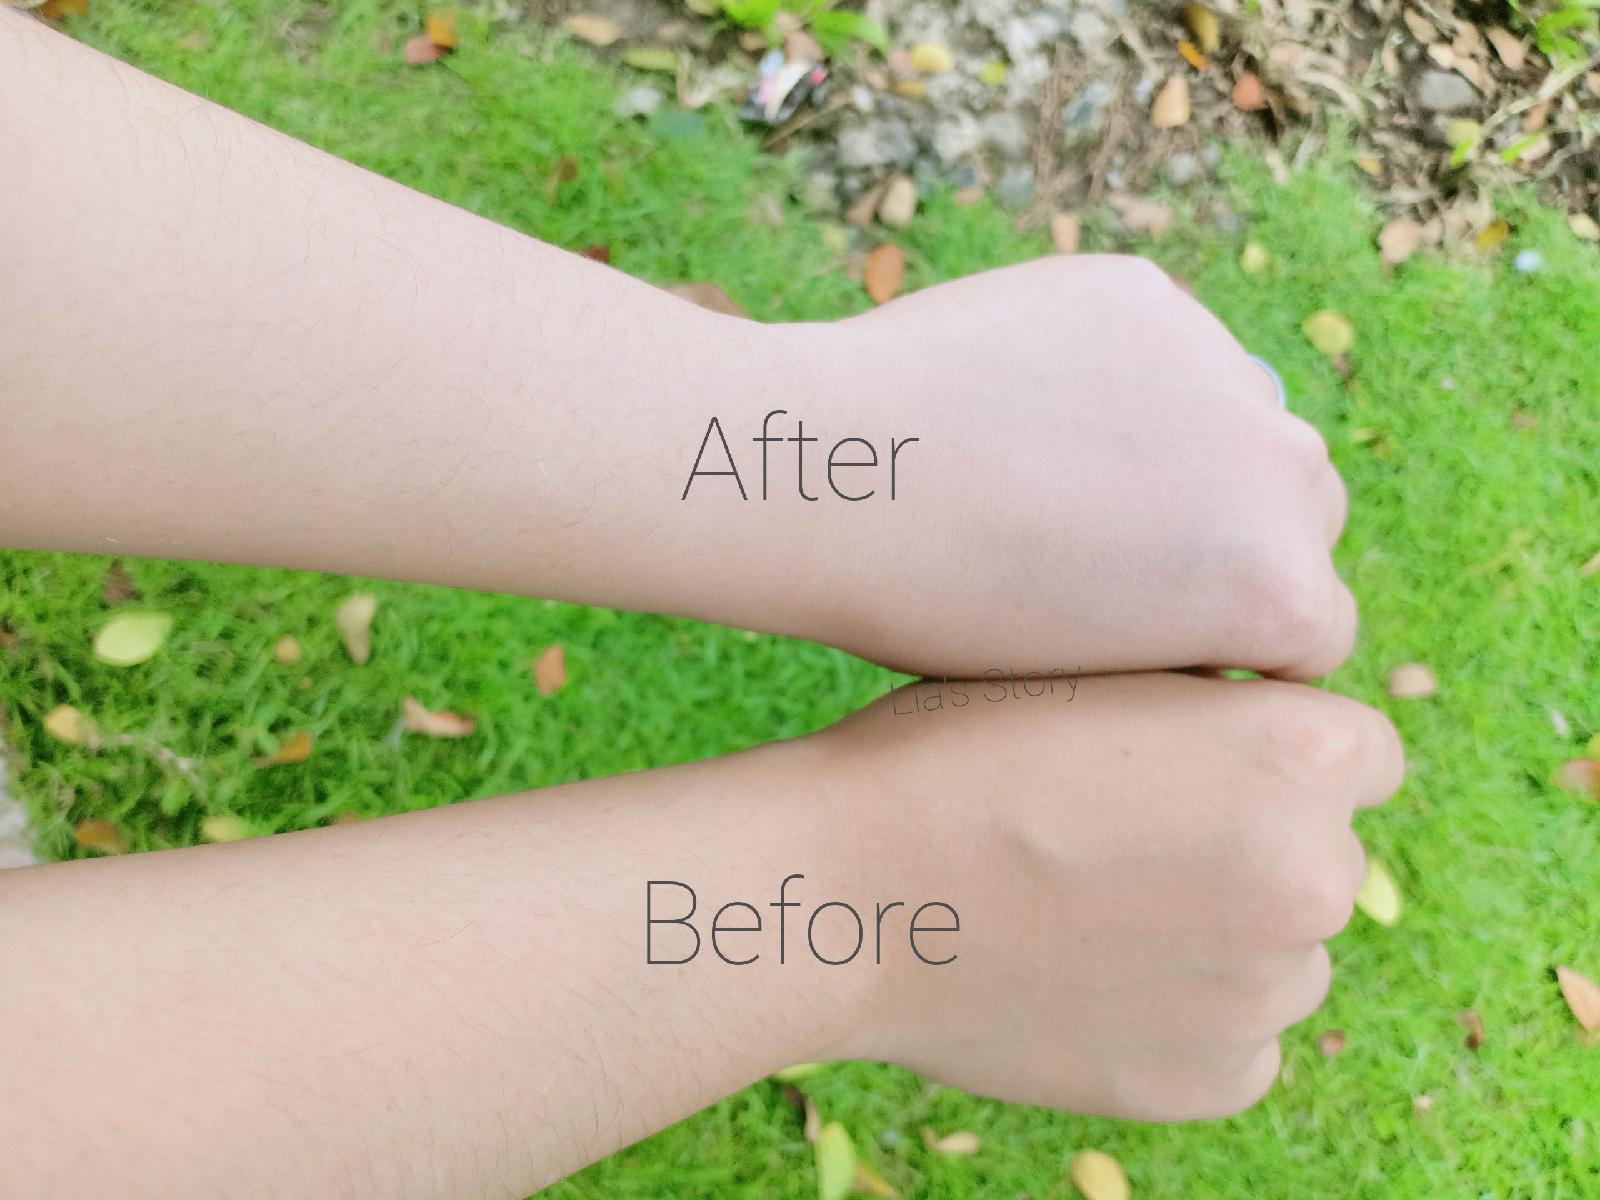 review-ulthyme-brightening-body-serum-hasil-pemakaian